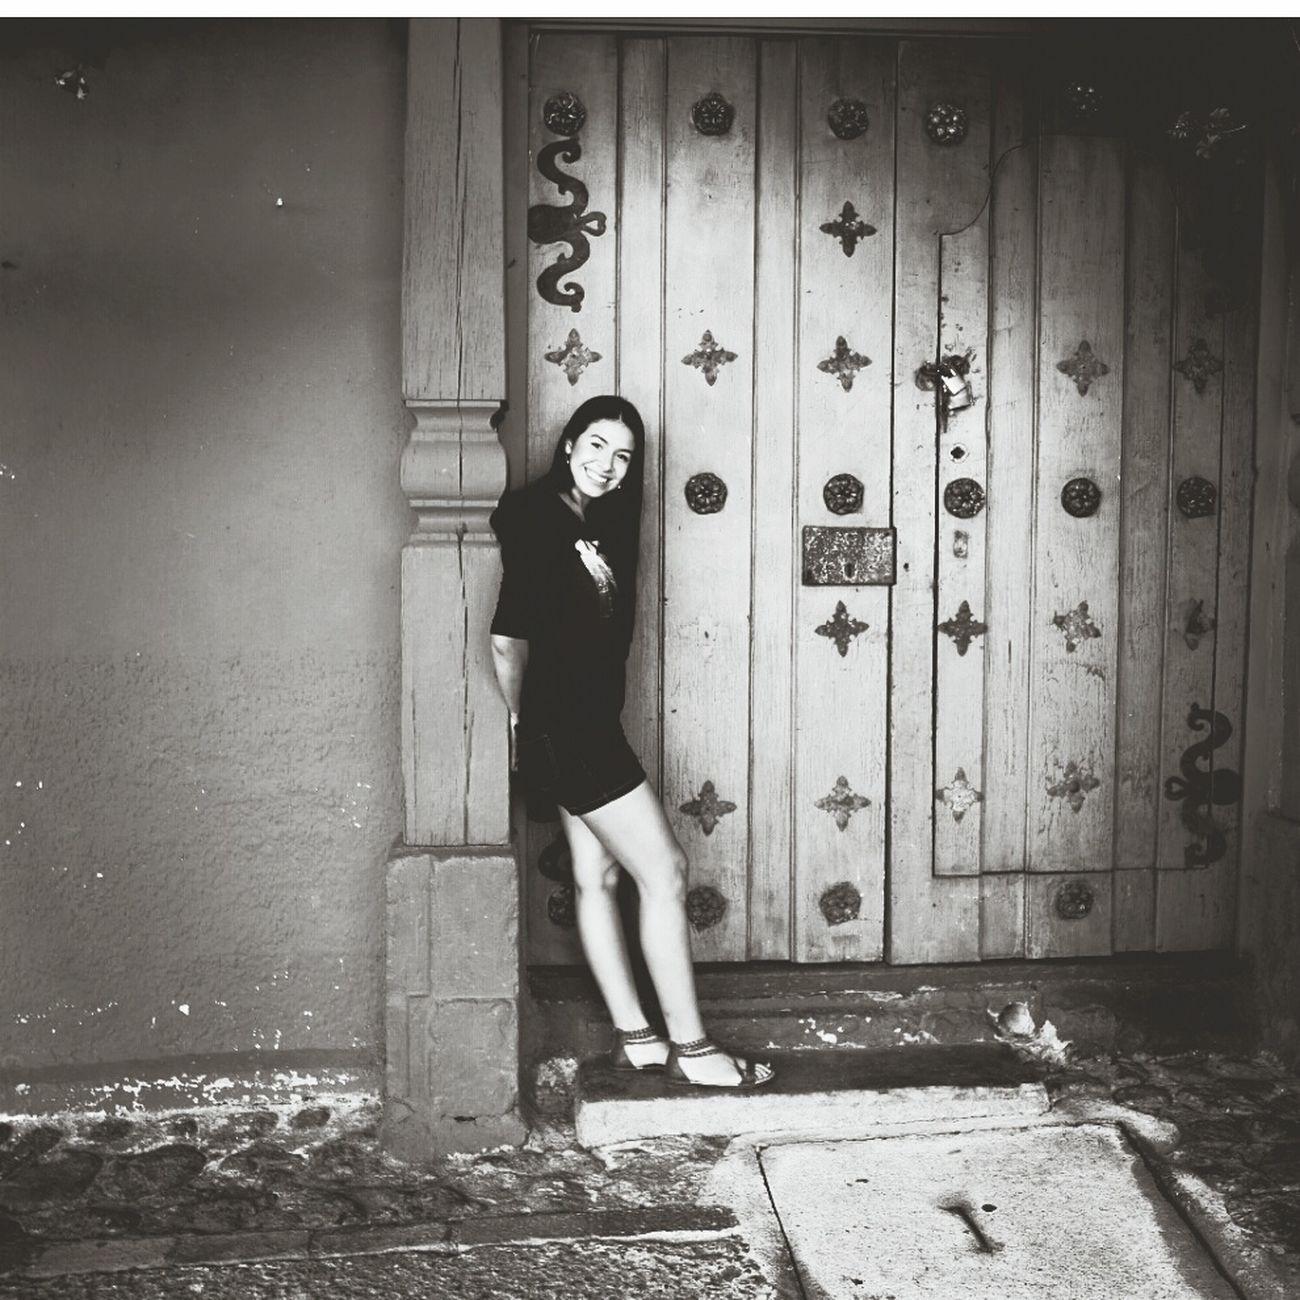 Blackandwhite Photography Valledeangeles Honduras ♥